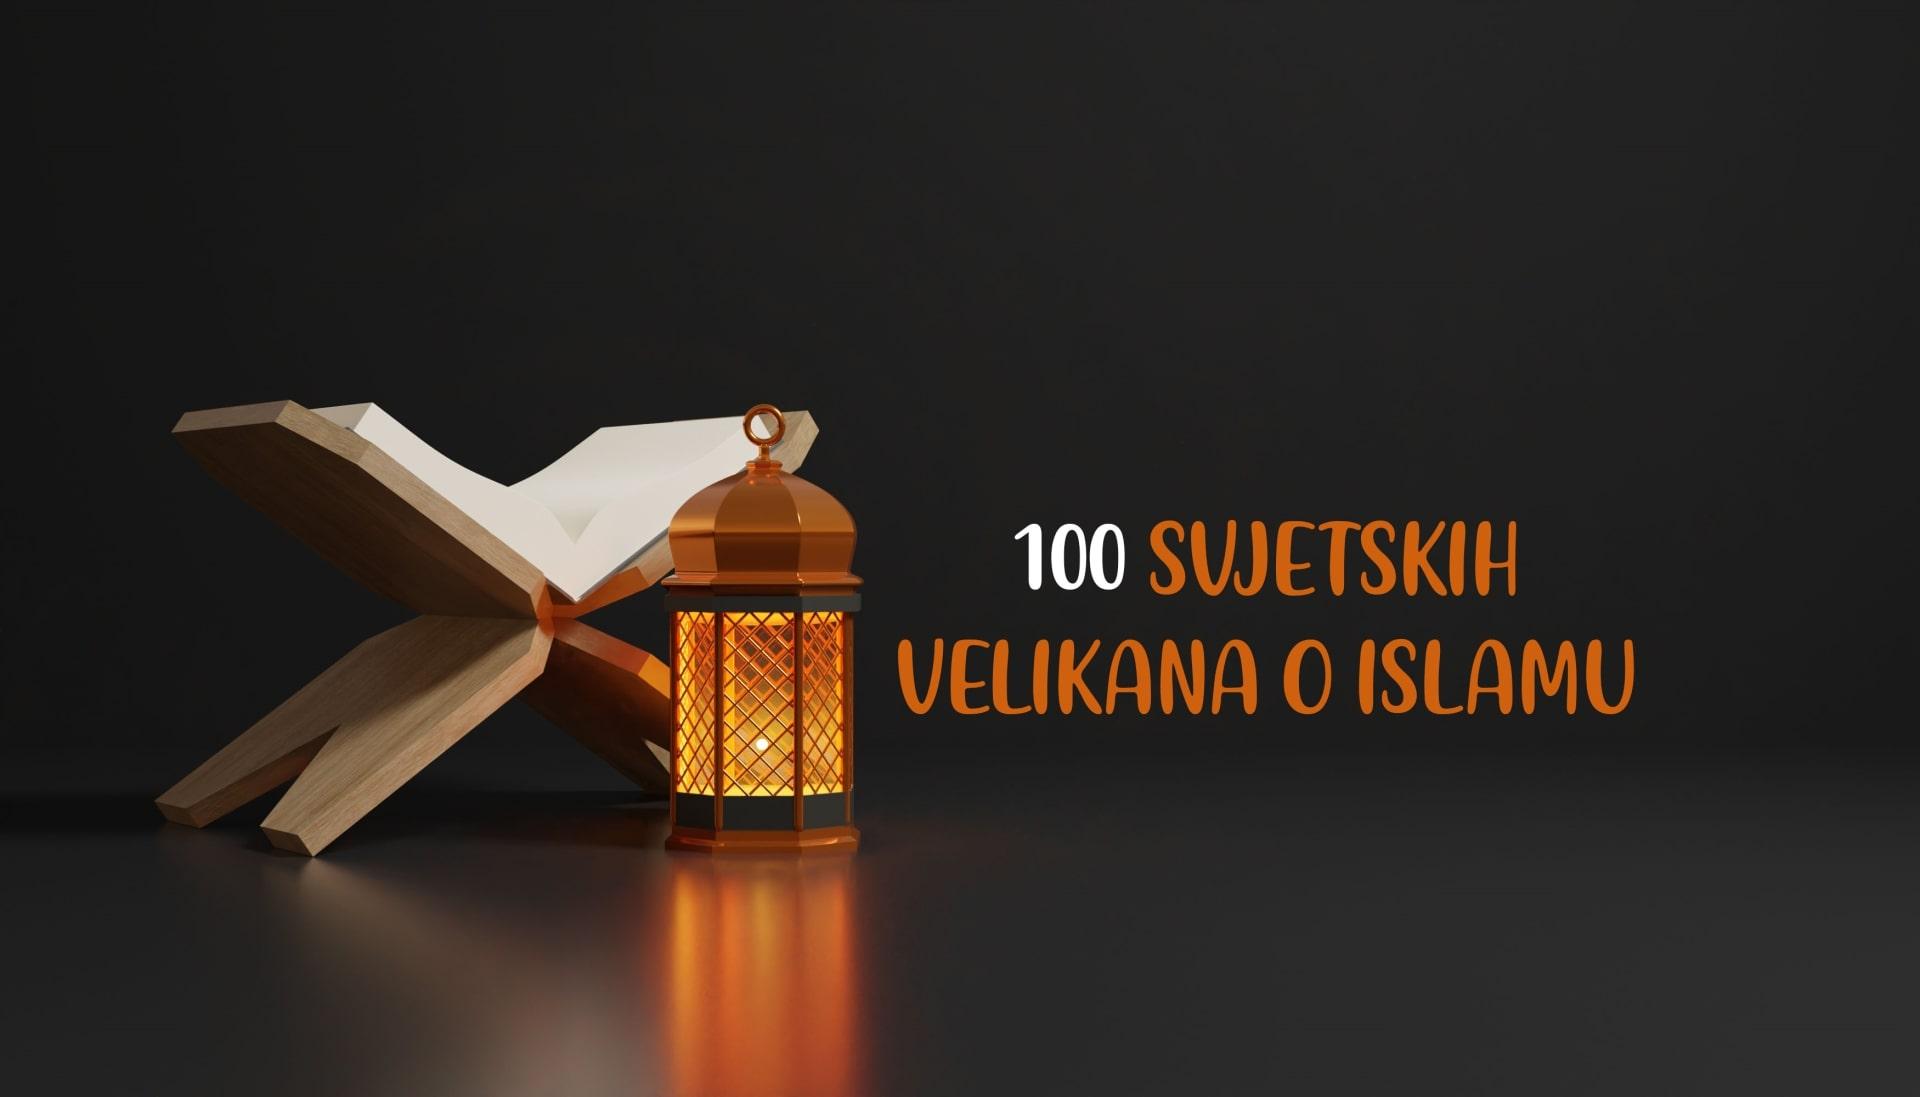 100 svjetskih velikana o islamu – Emile Dermenghem Samir Bikić 100 svjetskih velikana o islamu Poučne priče Islamska literatura Islamski blog El-Kelimeh